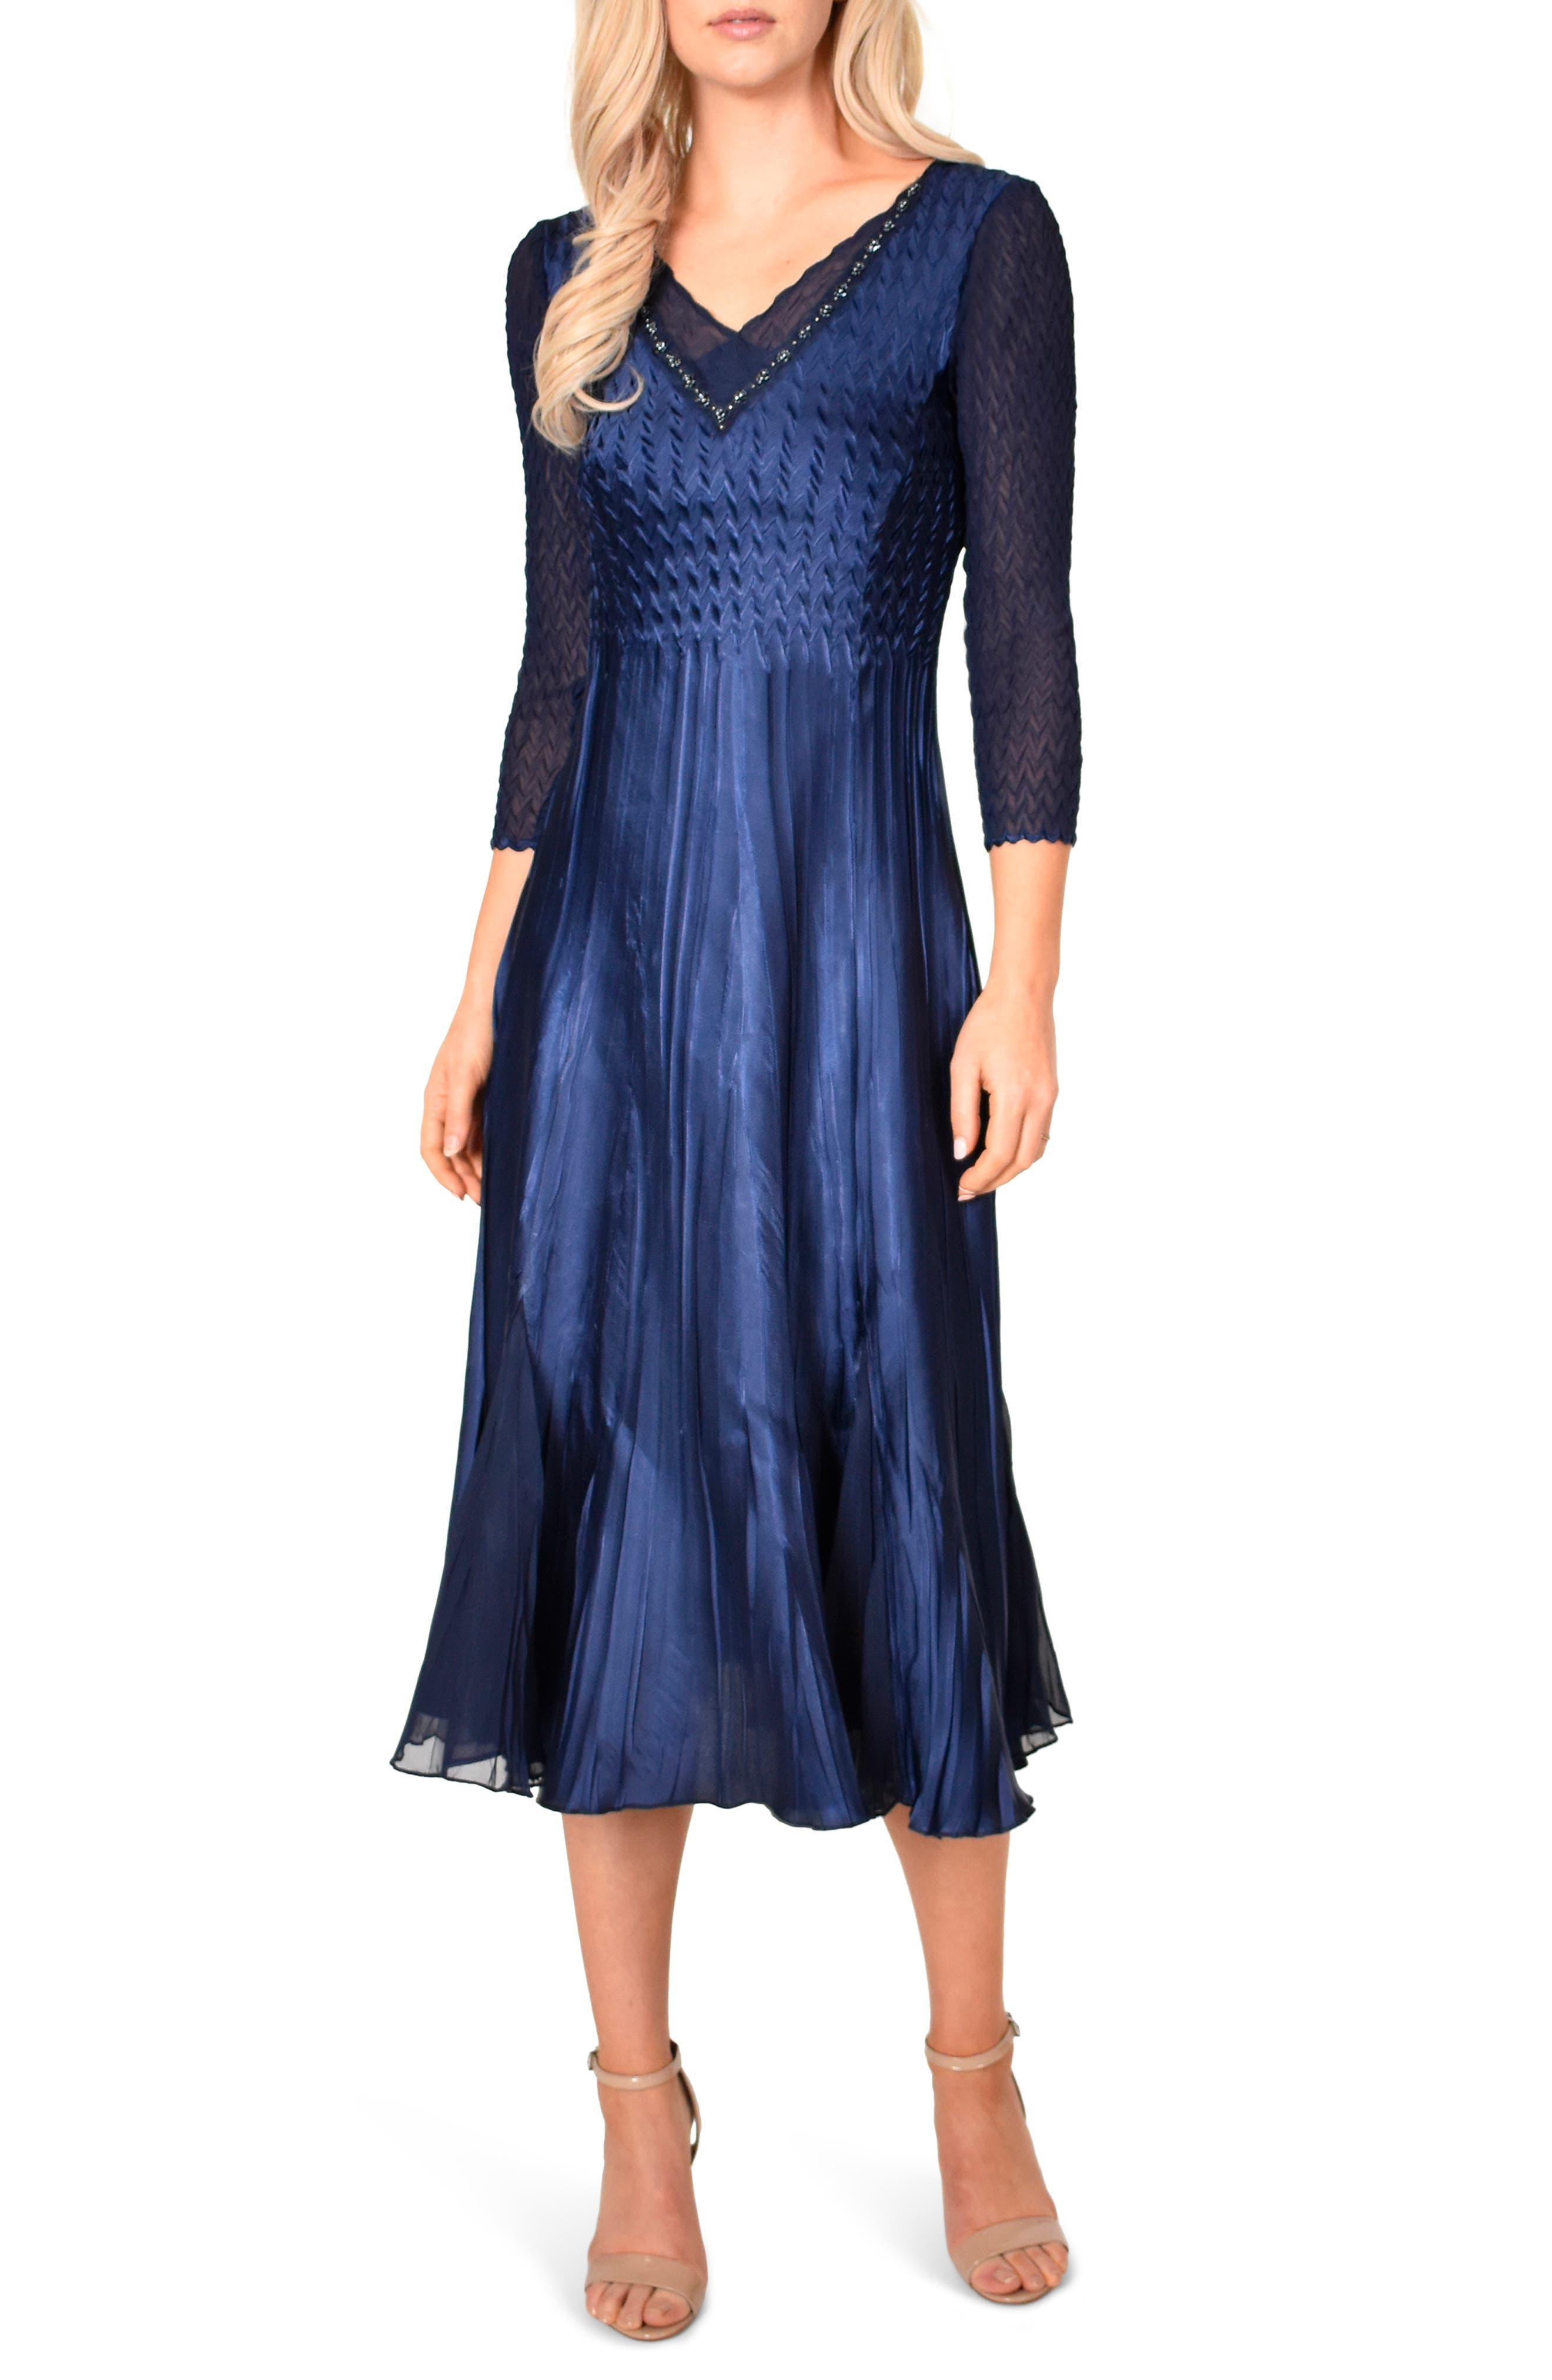 Petite Kamarov Charmuese & Chiffon Dress, Blue